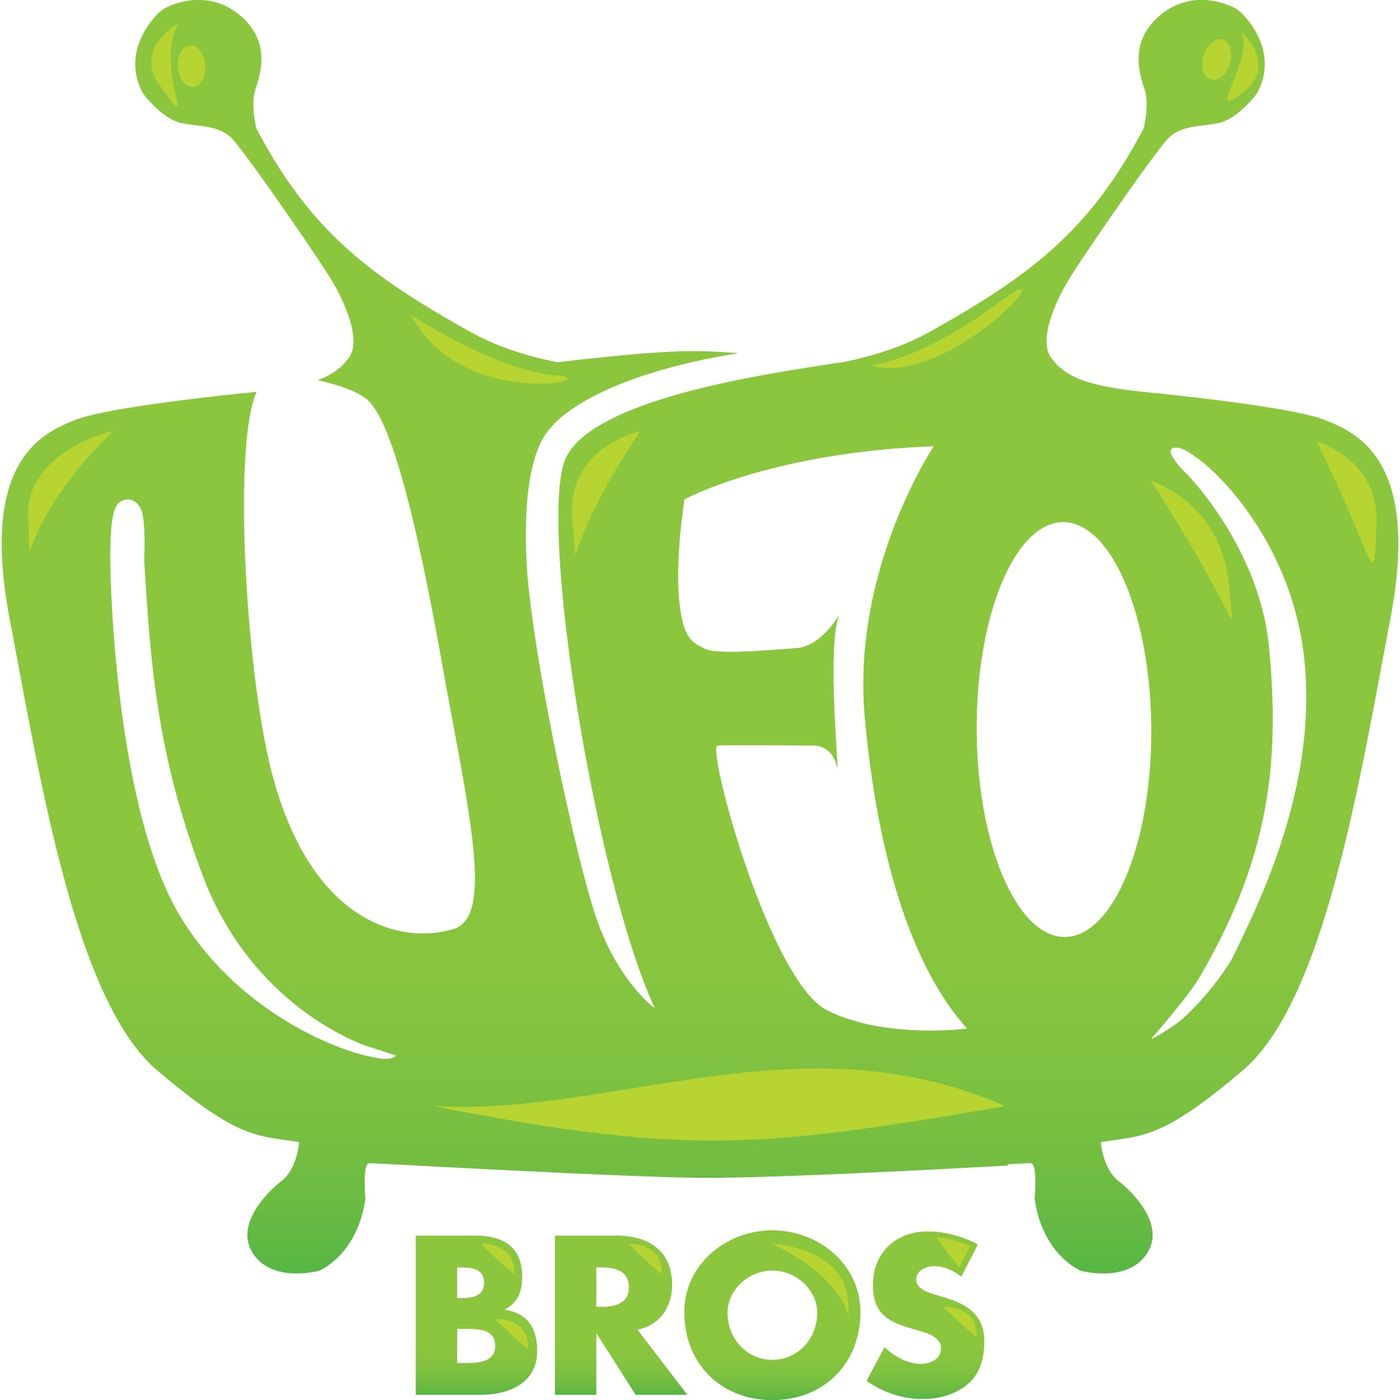 UFO BROS Probecast